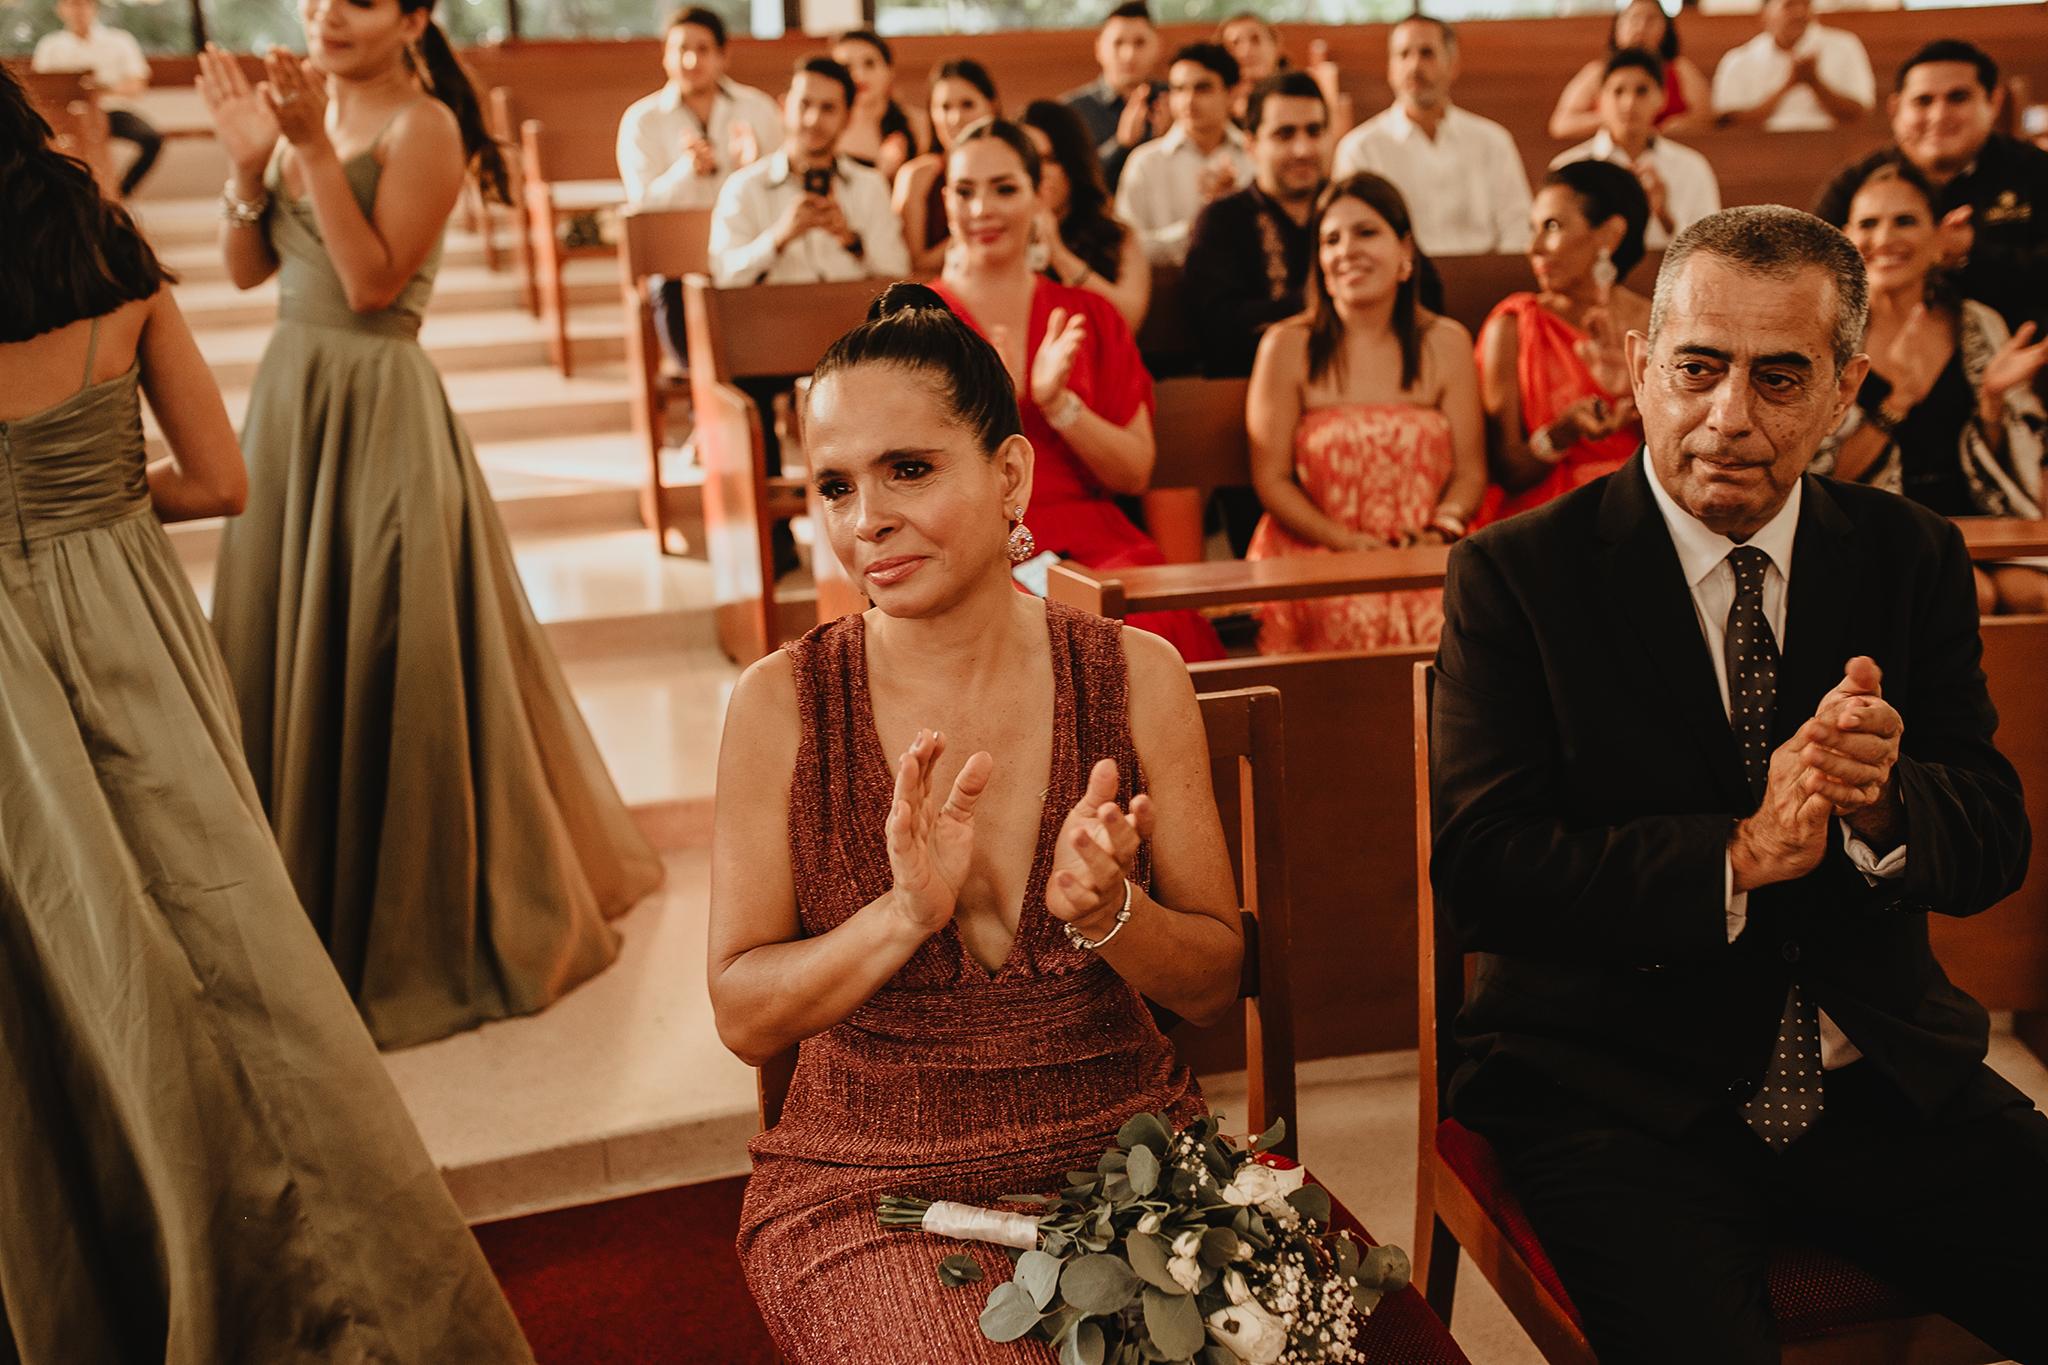 0686R&F__WeddingDestination_Weddingmerida_BodaMexico_FotografoDeBodas_FabrizioSimoneenFotografo.jpg